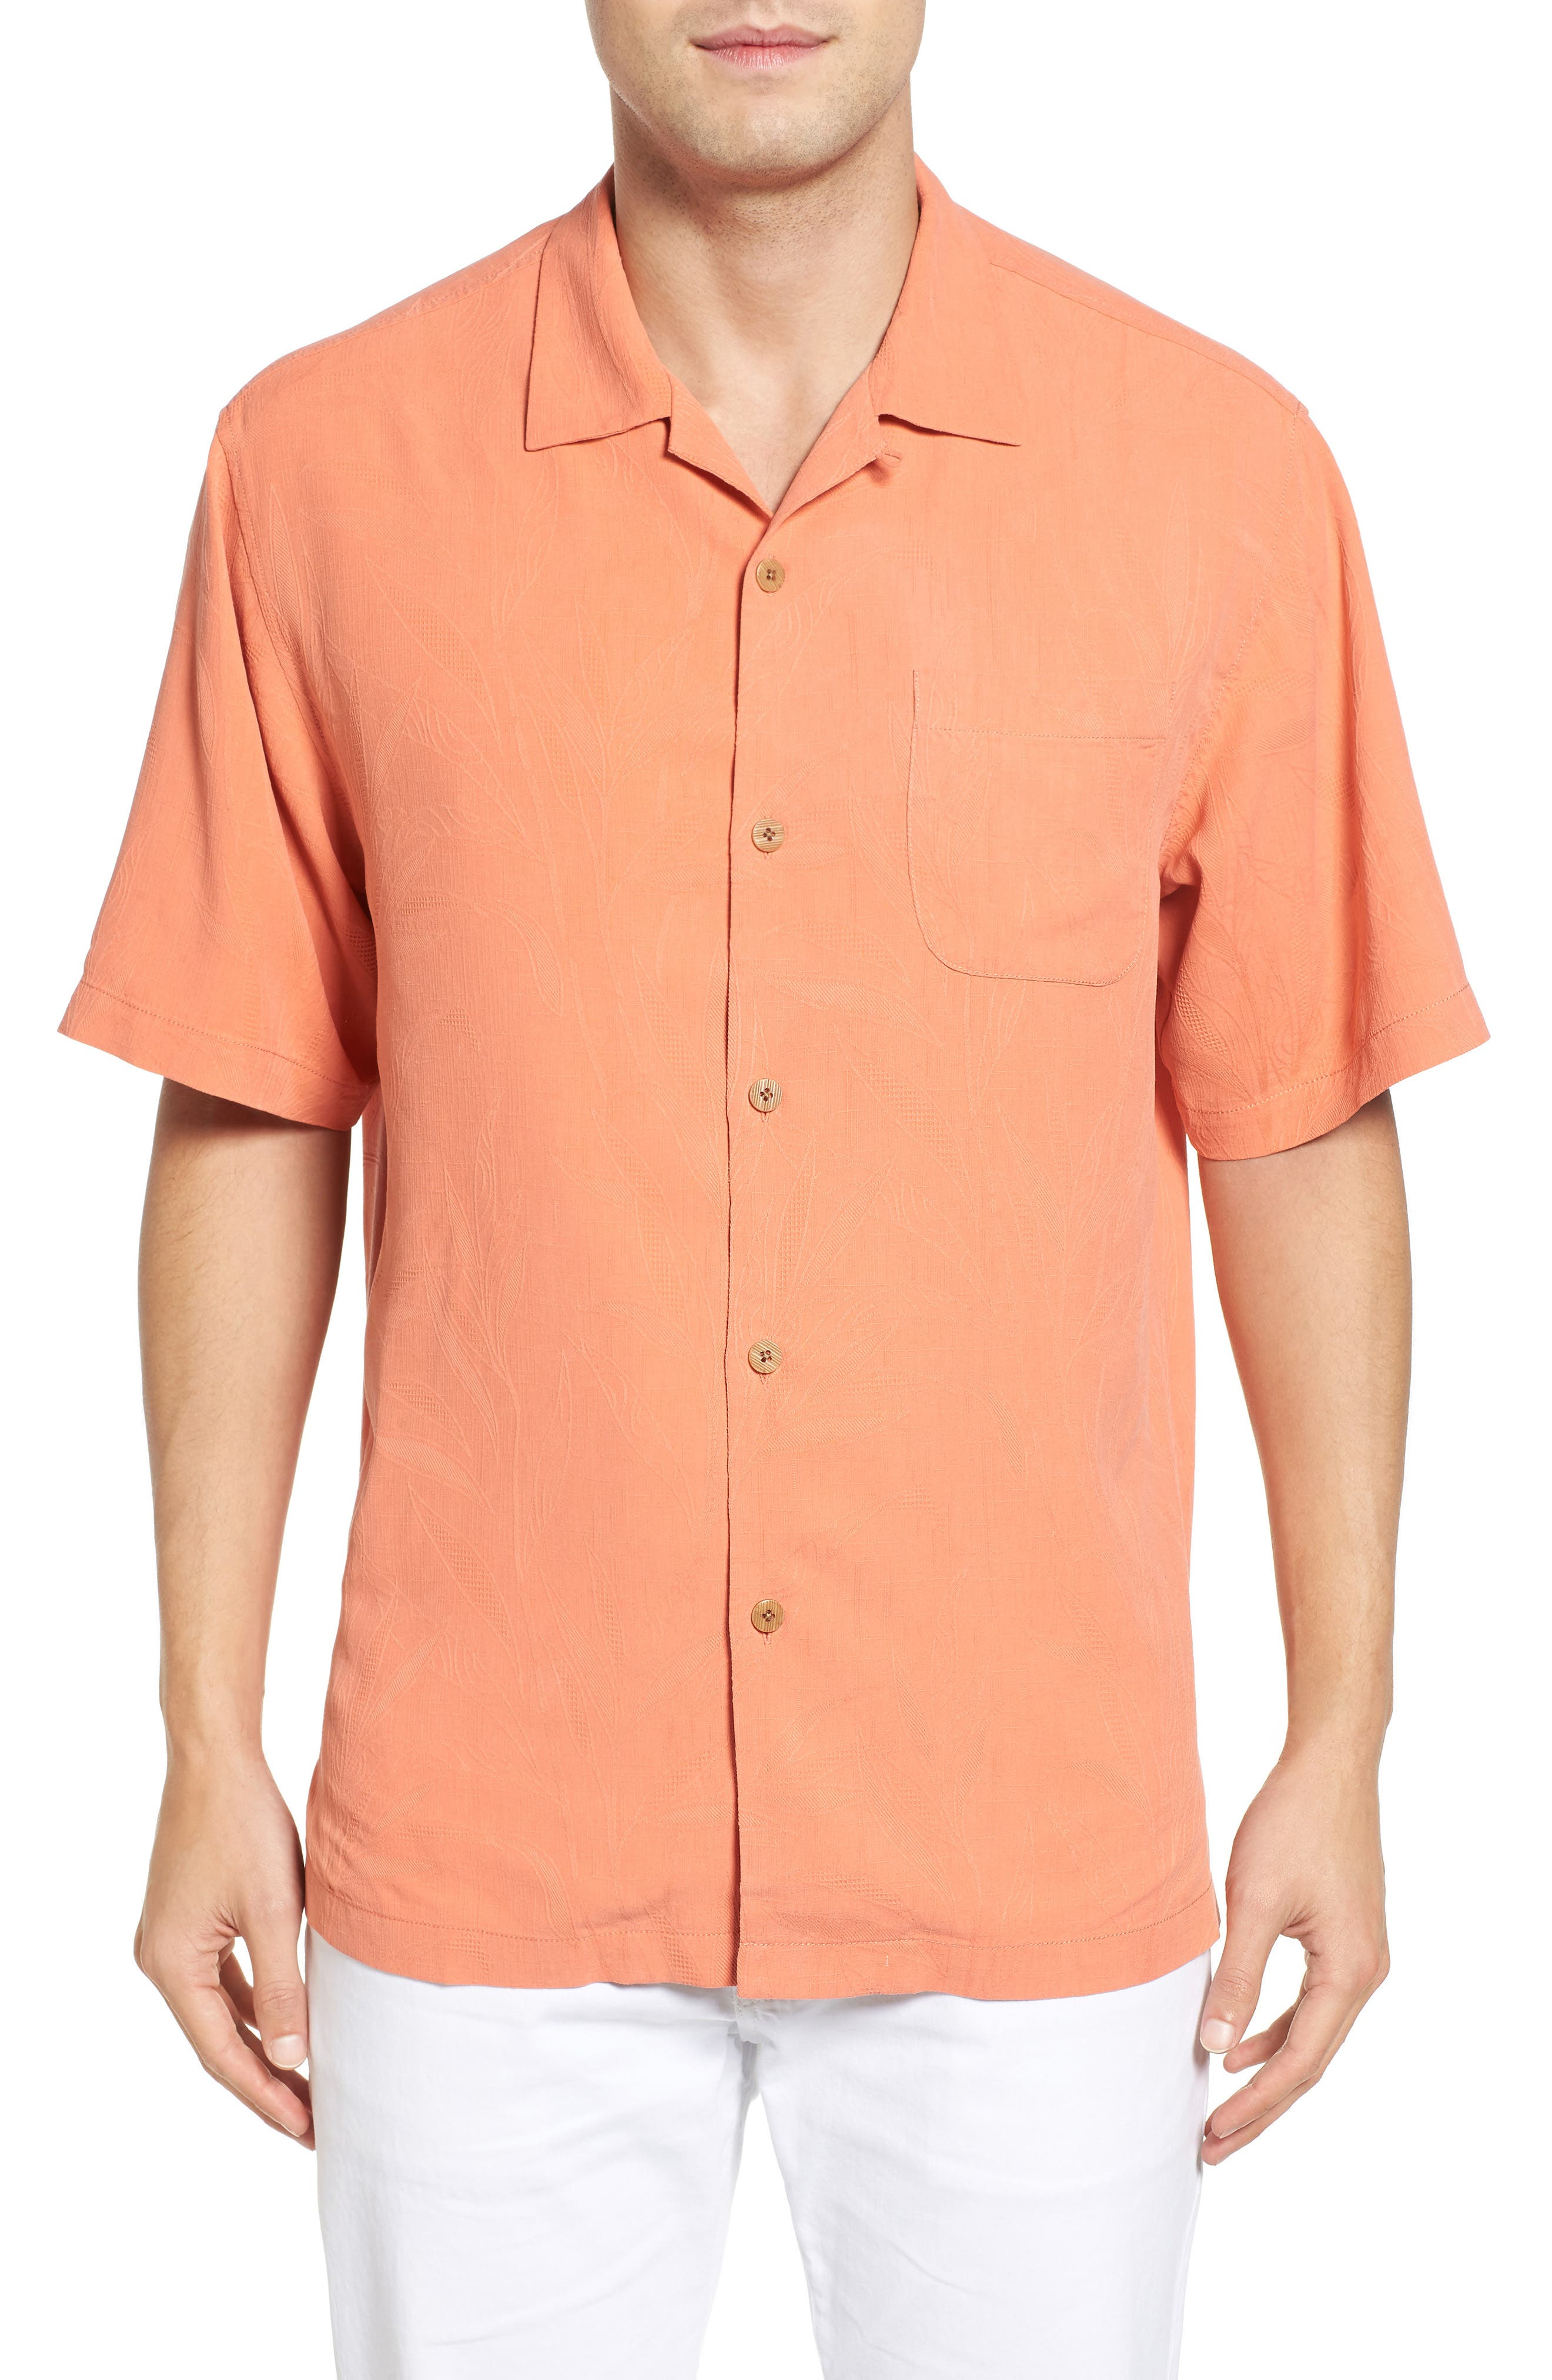 Main Image - Tommy Bahama Islander Fronds Silk Camp Shirt